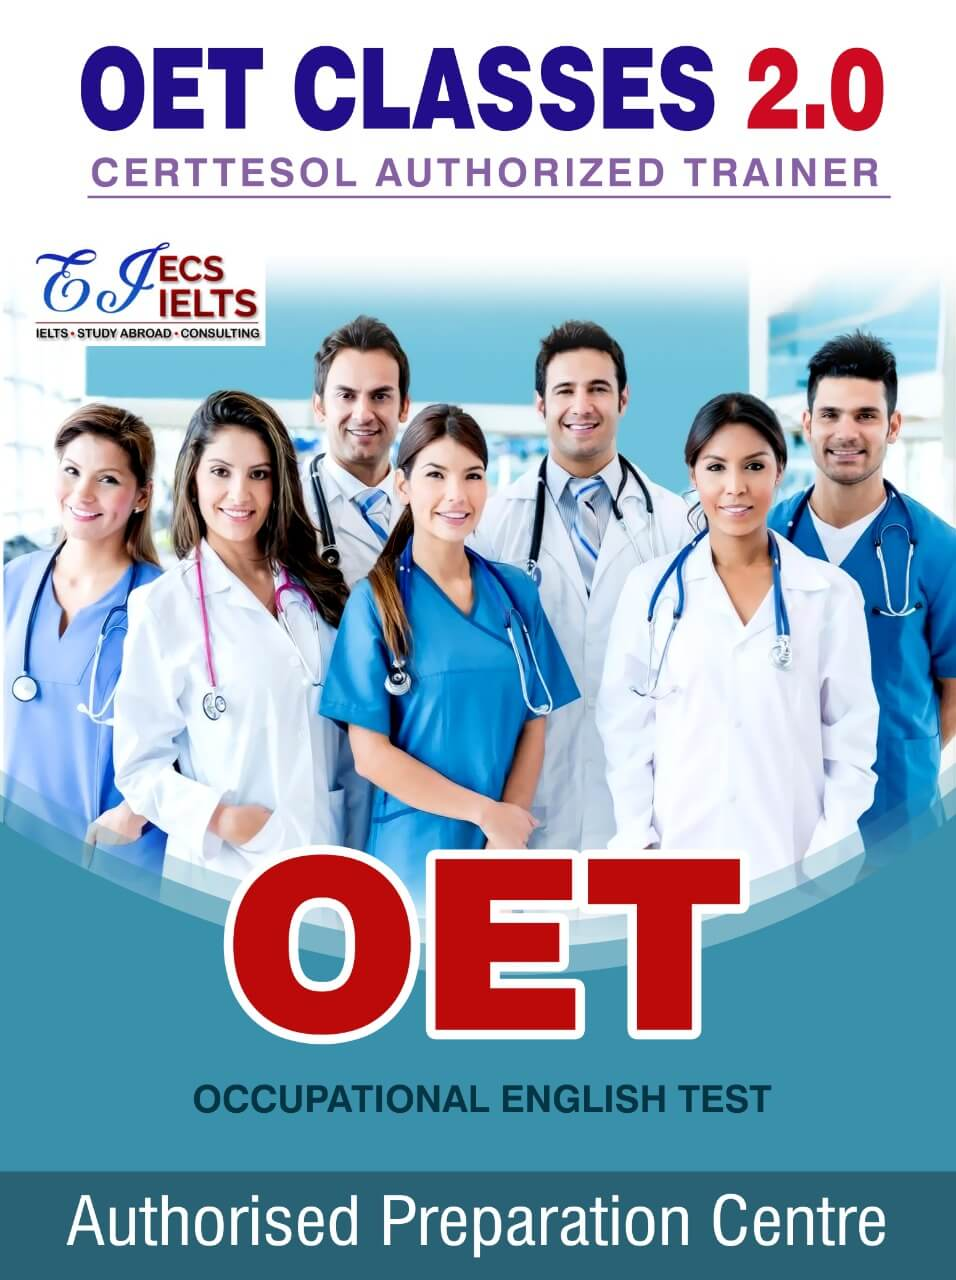 IELTS Online Coching Training - OET - 5